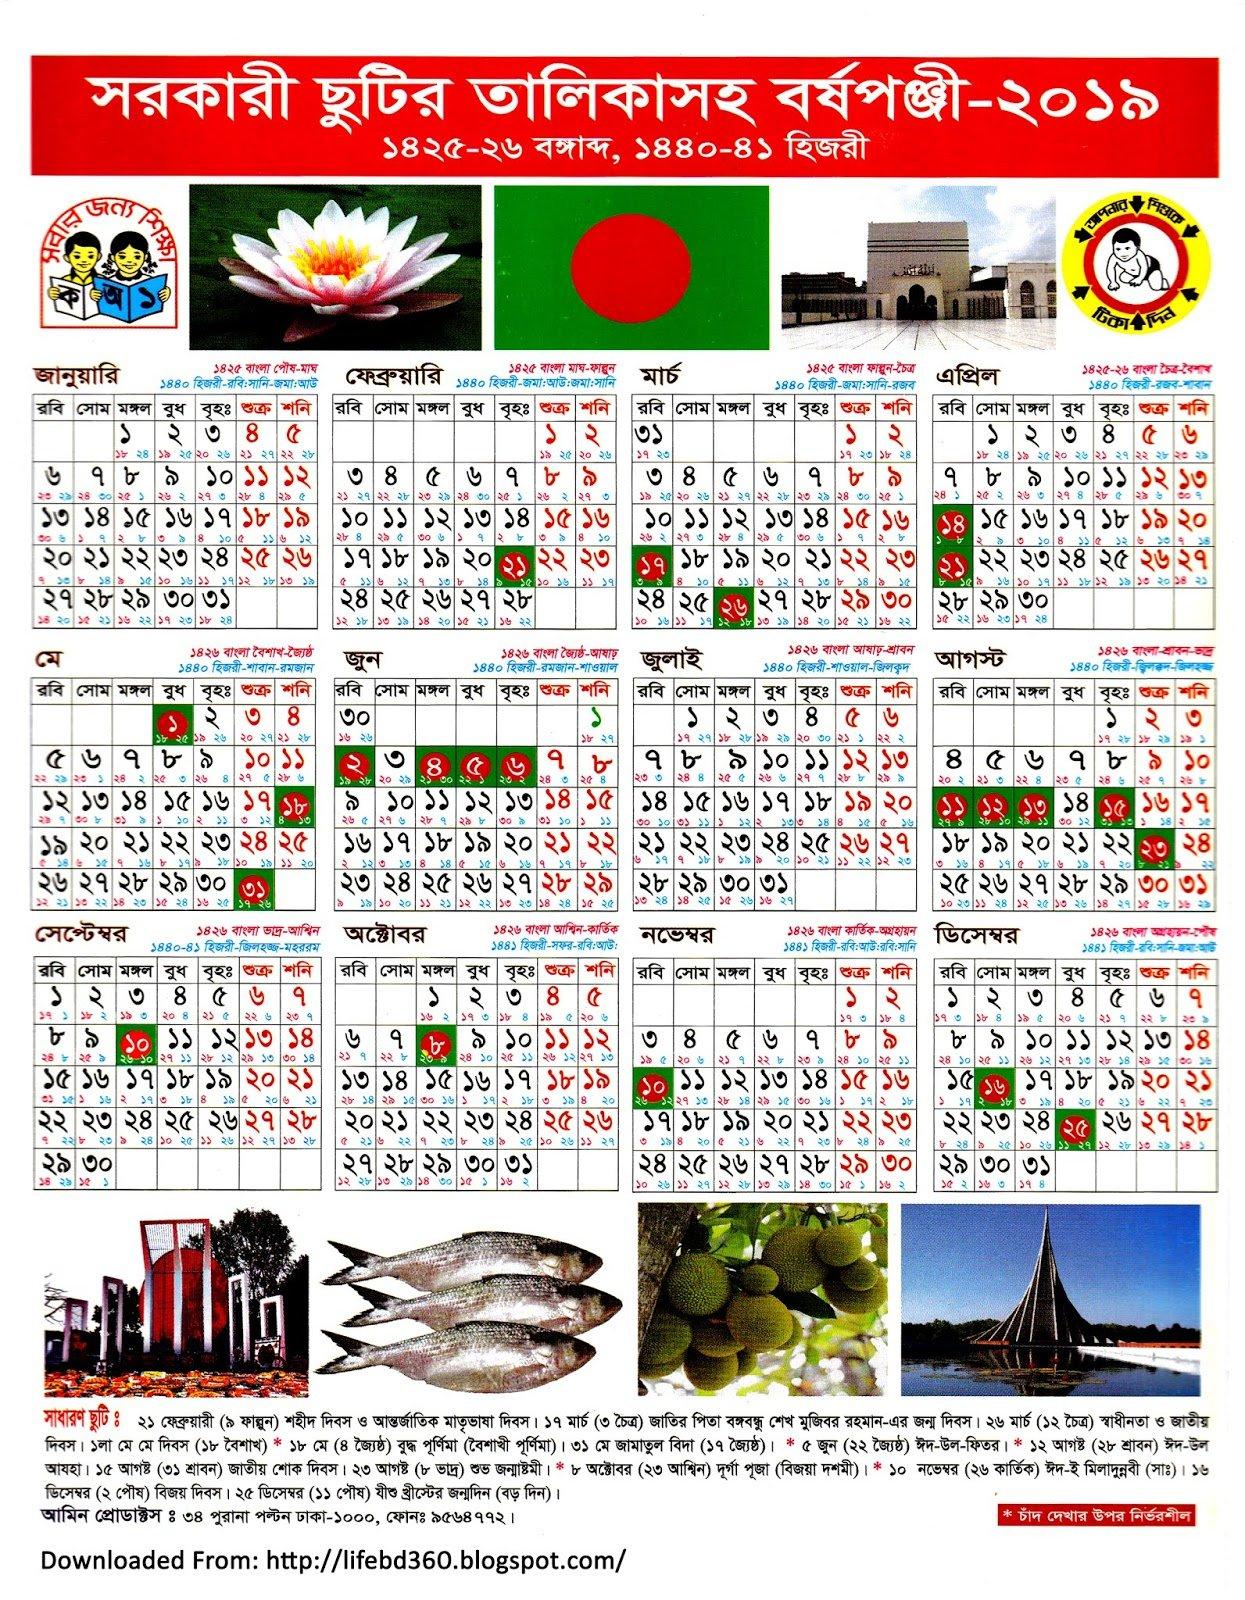 Bangladesh Government Holiday Calendar 2019   Life In Bangladesh Calendar 2019 Government Holidays